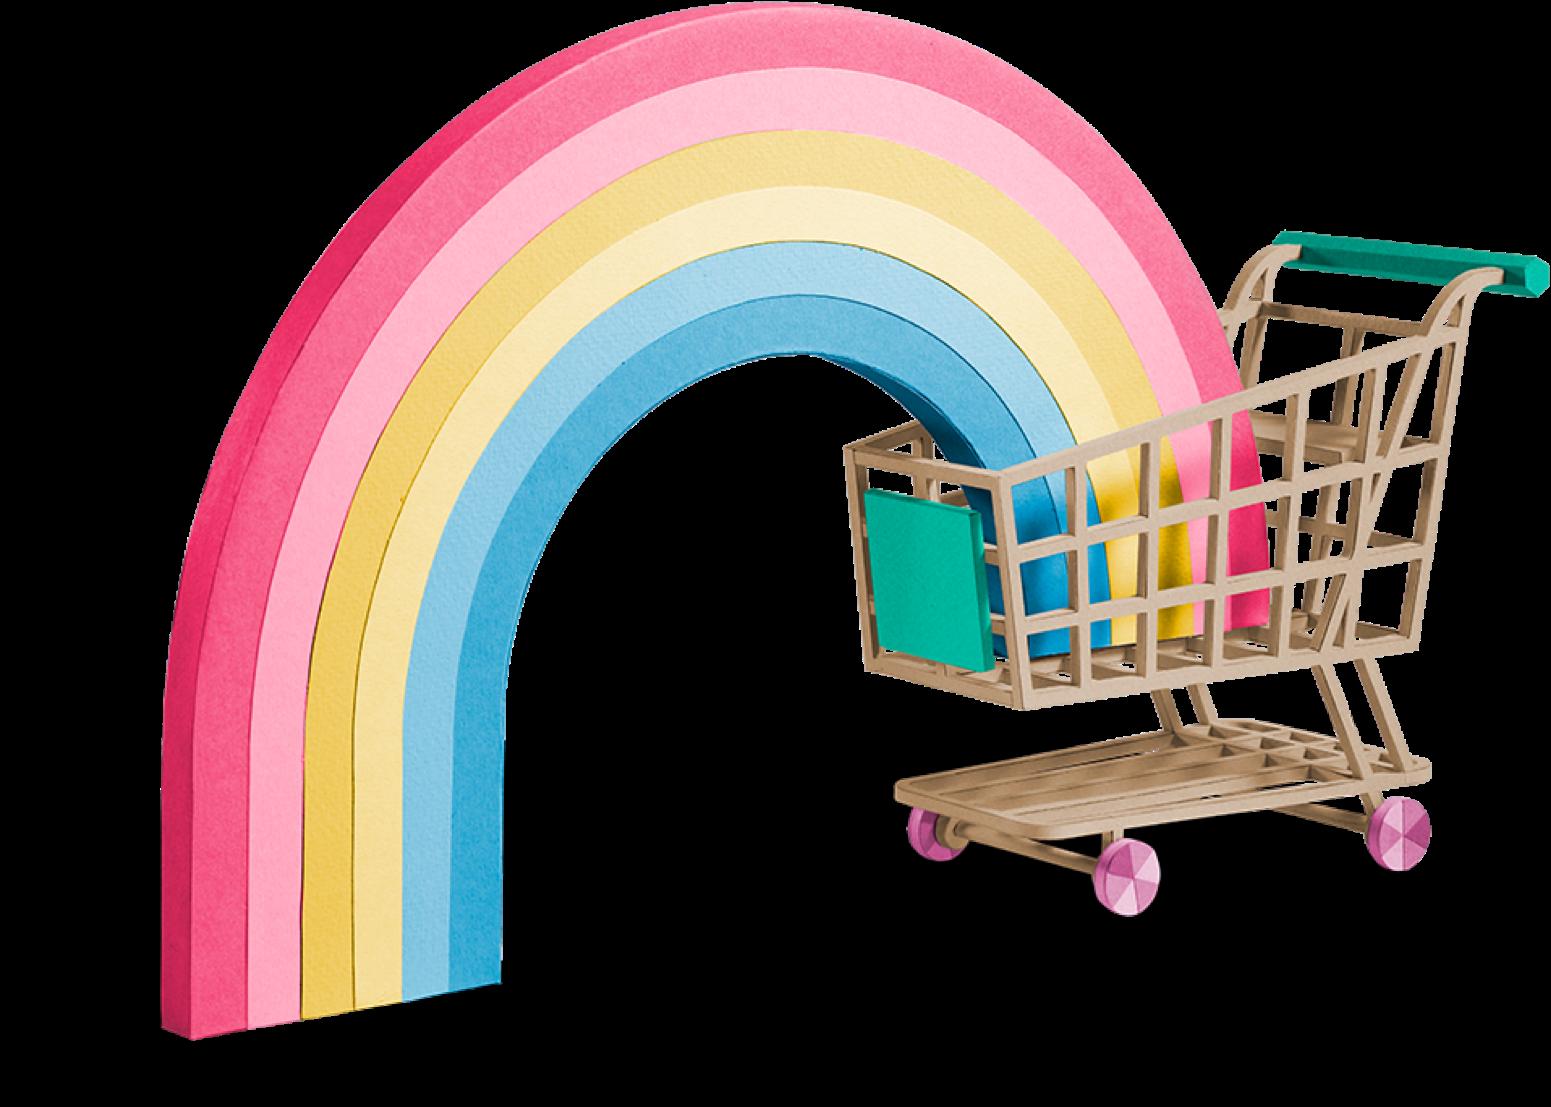 Whole Foods Amazon Prime Day 2019